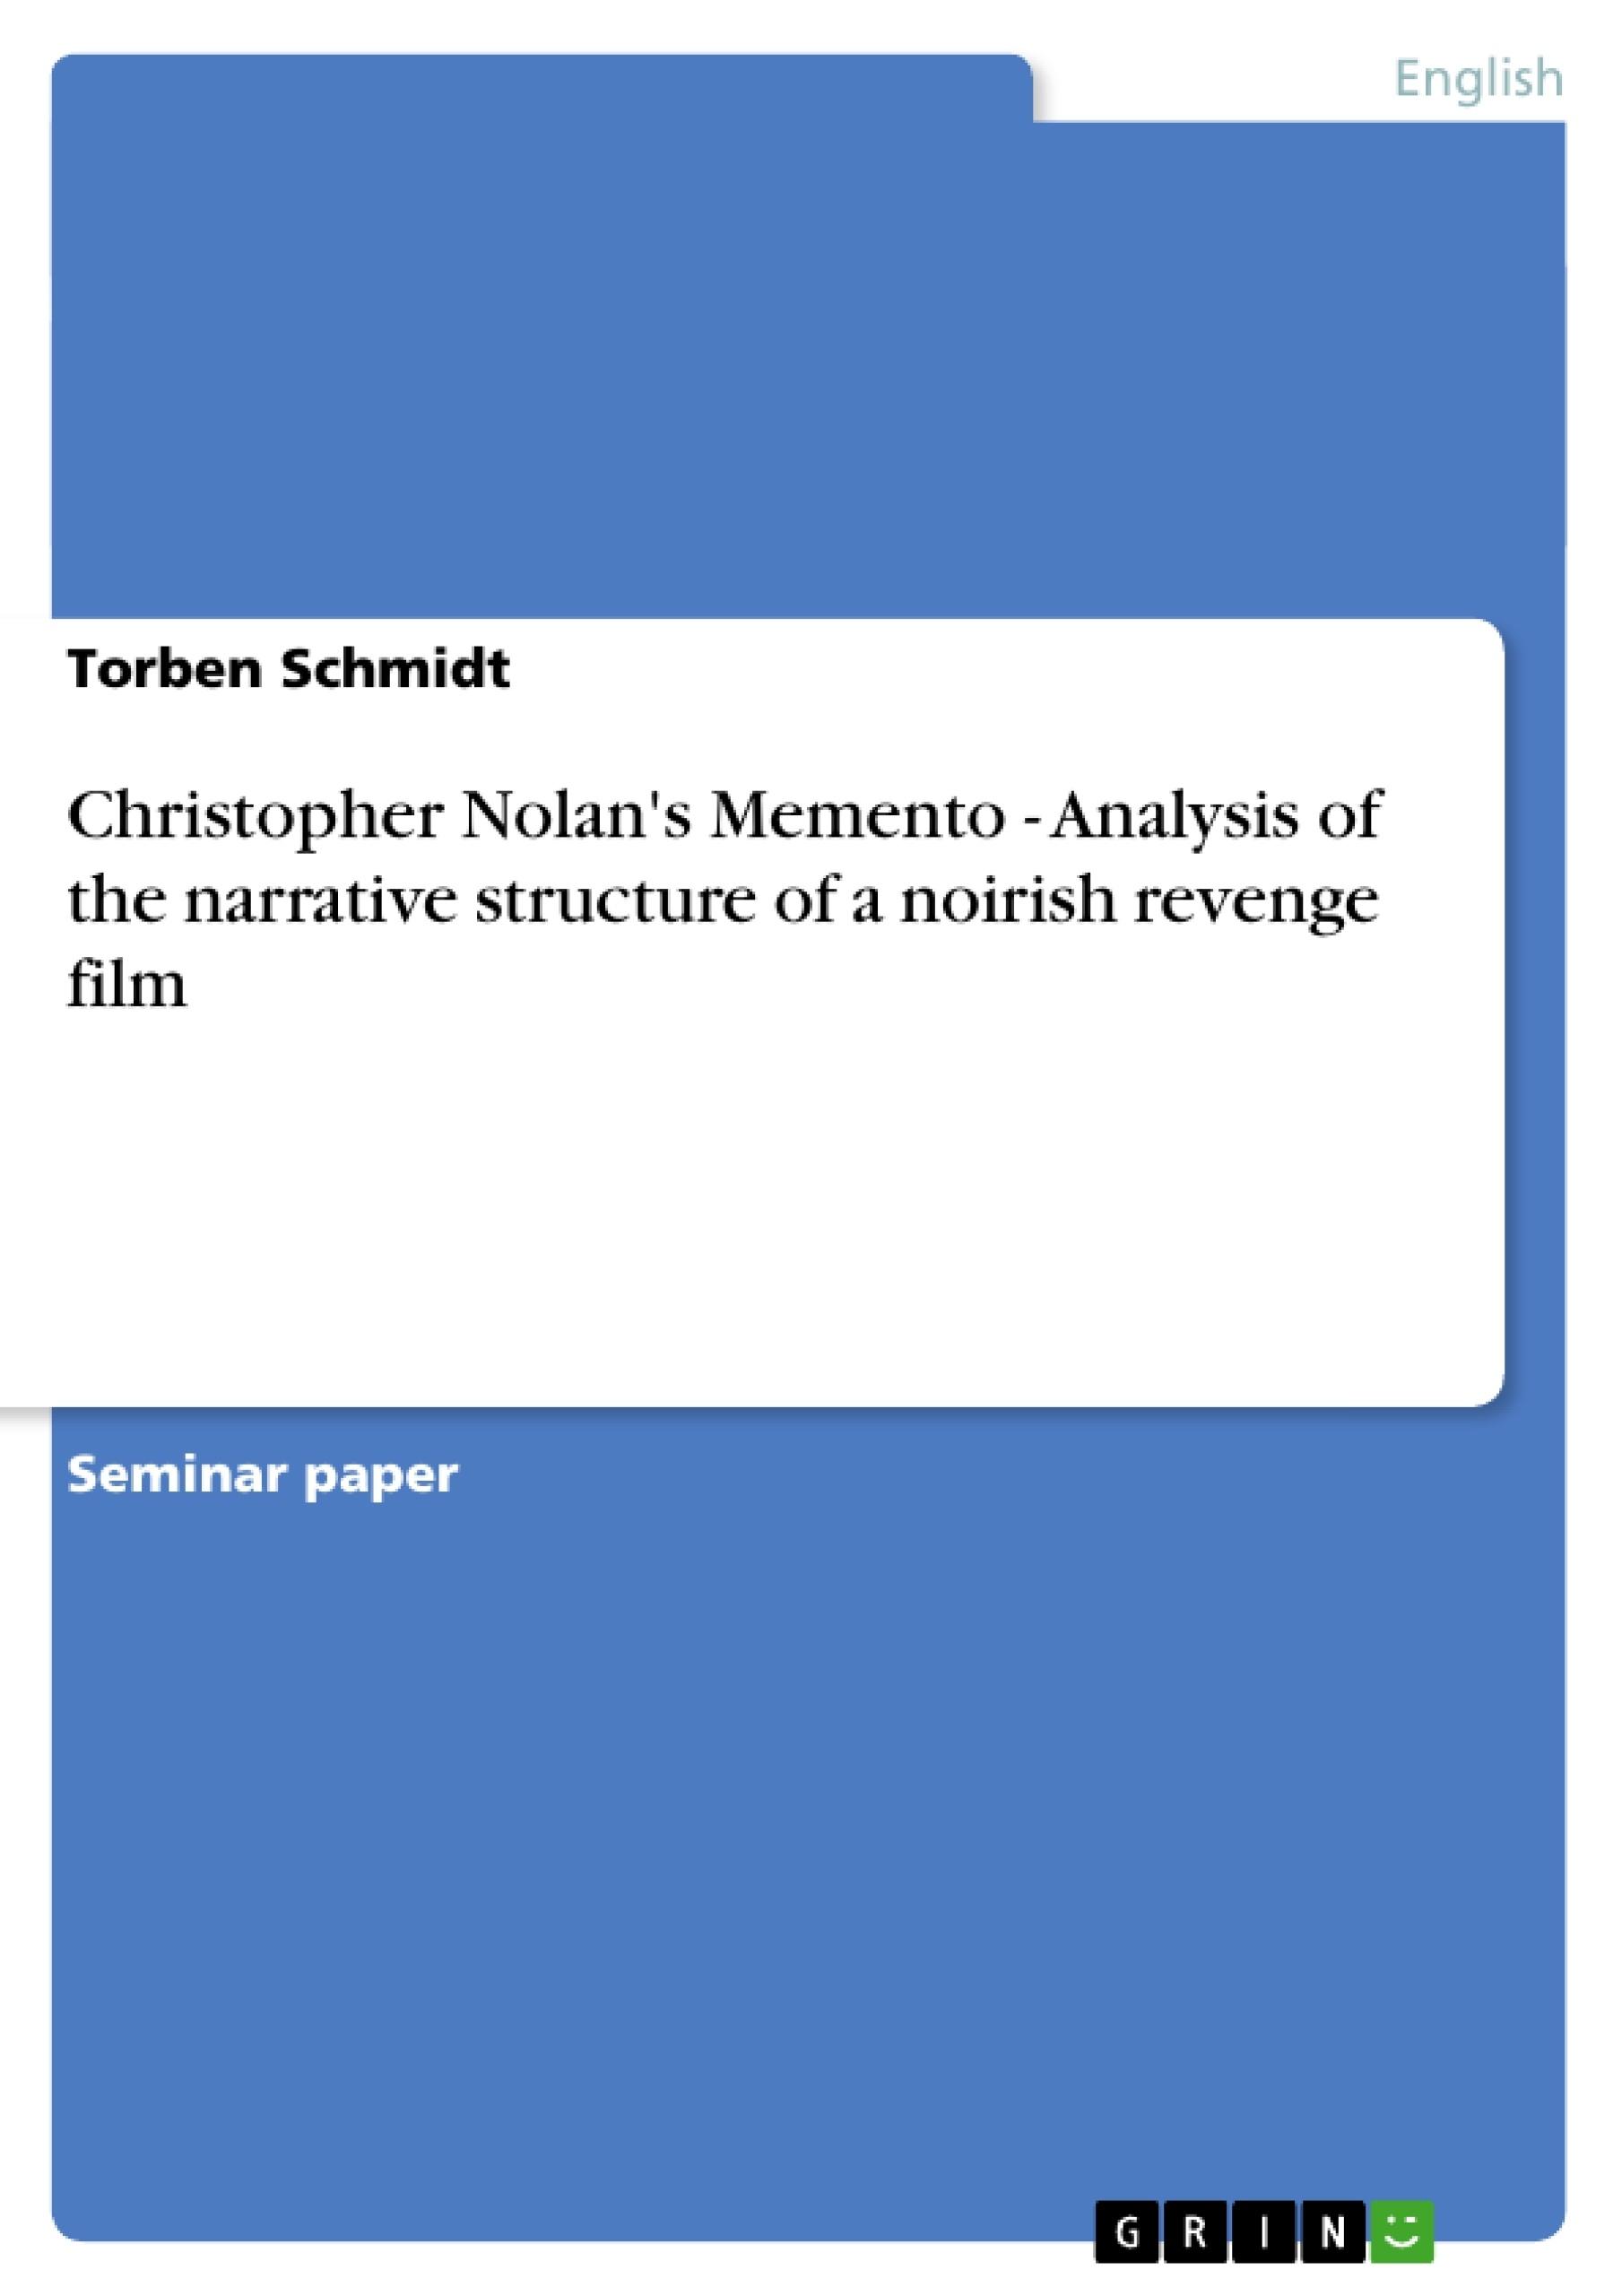 Title: Christopher Nolan's Memento - Analysis of the narrative structure of a noirish revenge film